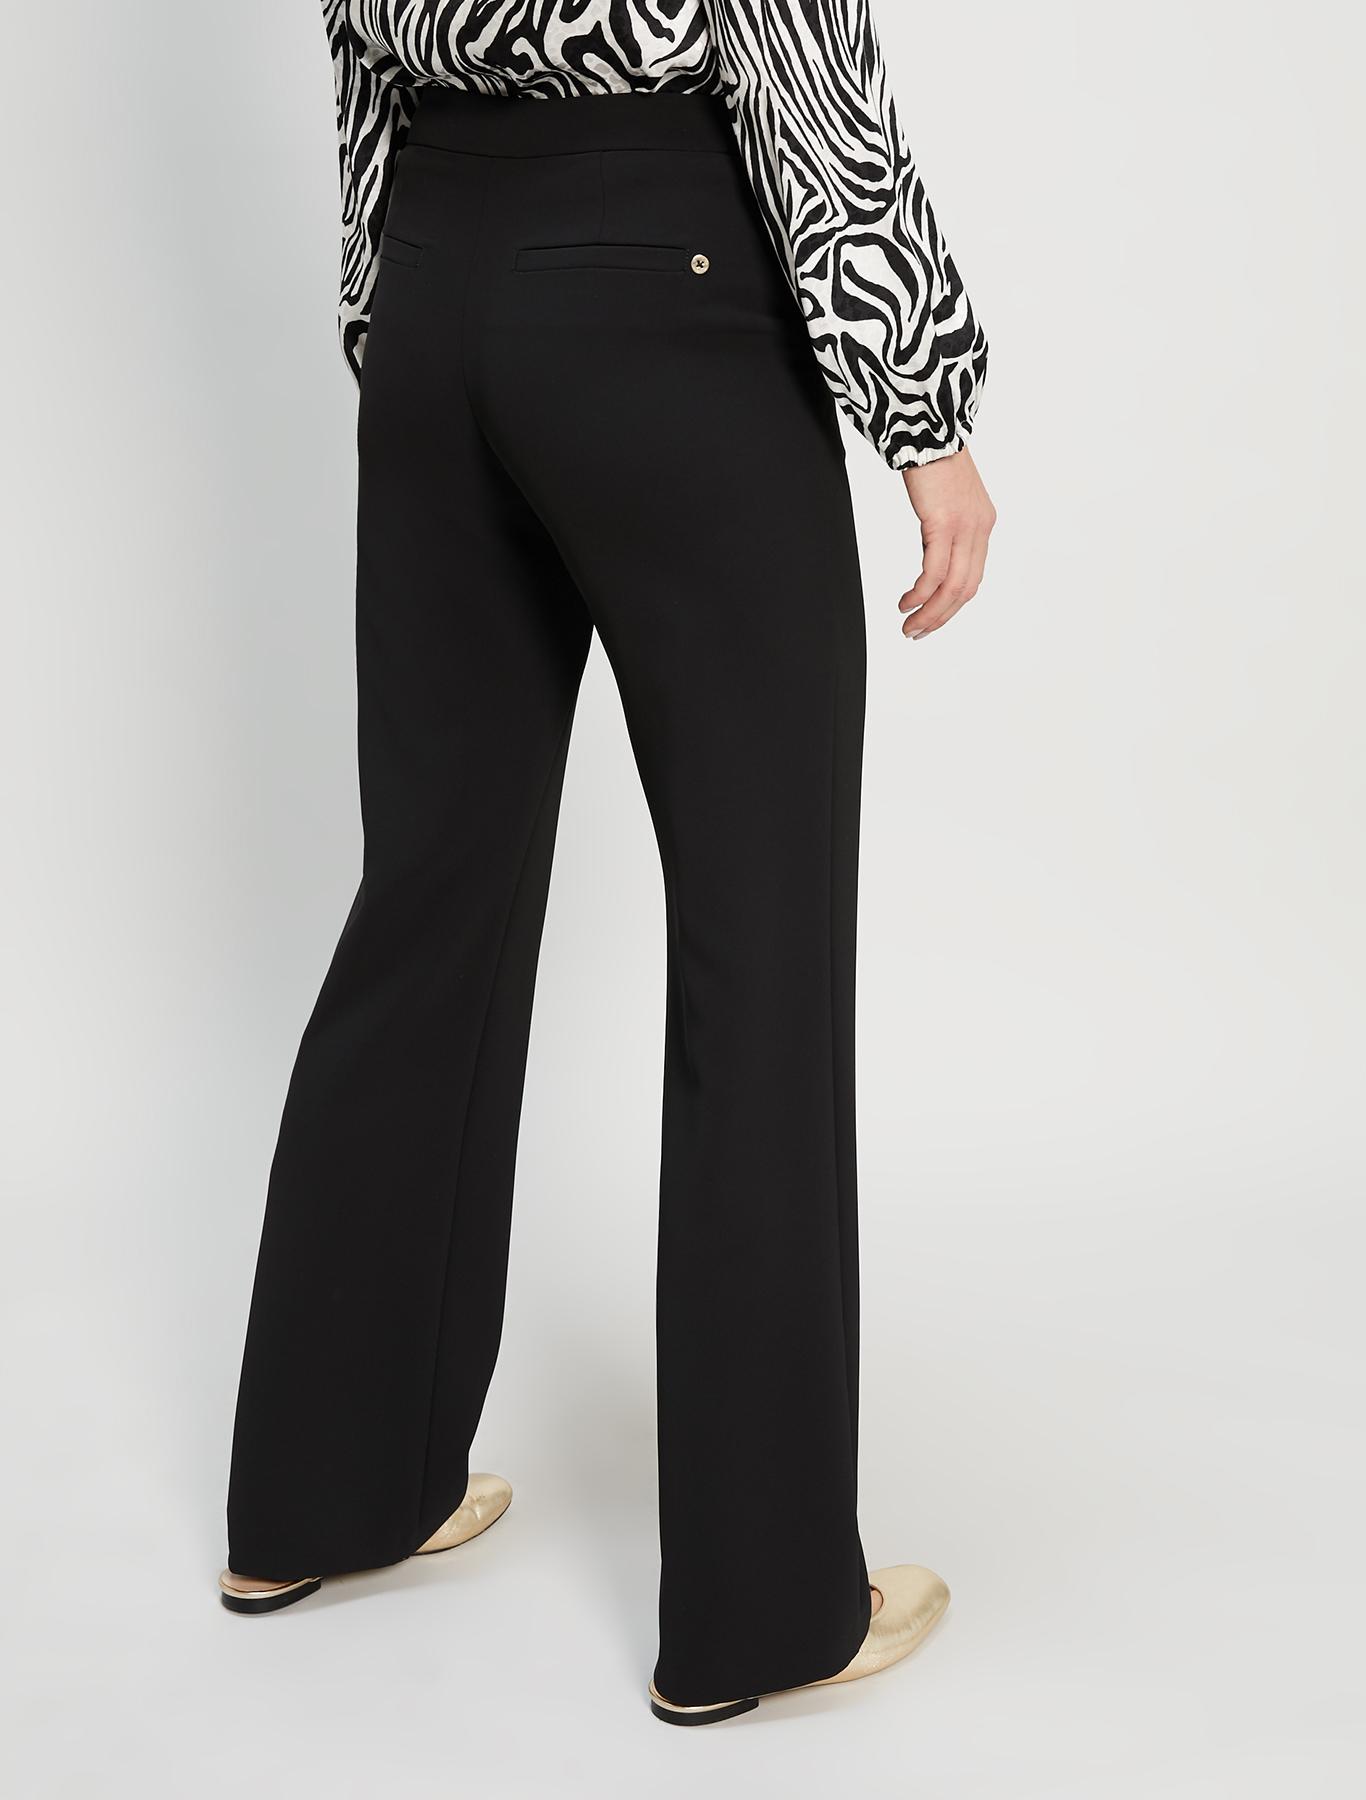 Straight-leg trousers - black - pennyblack